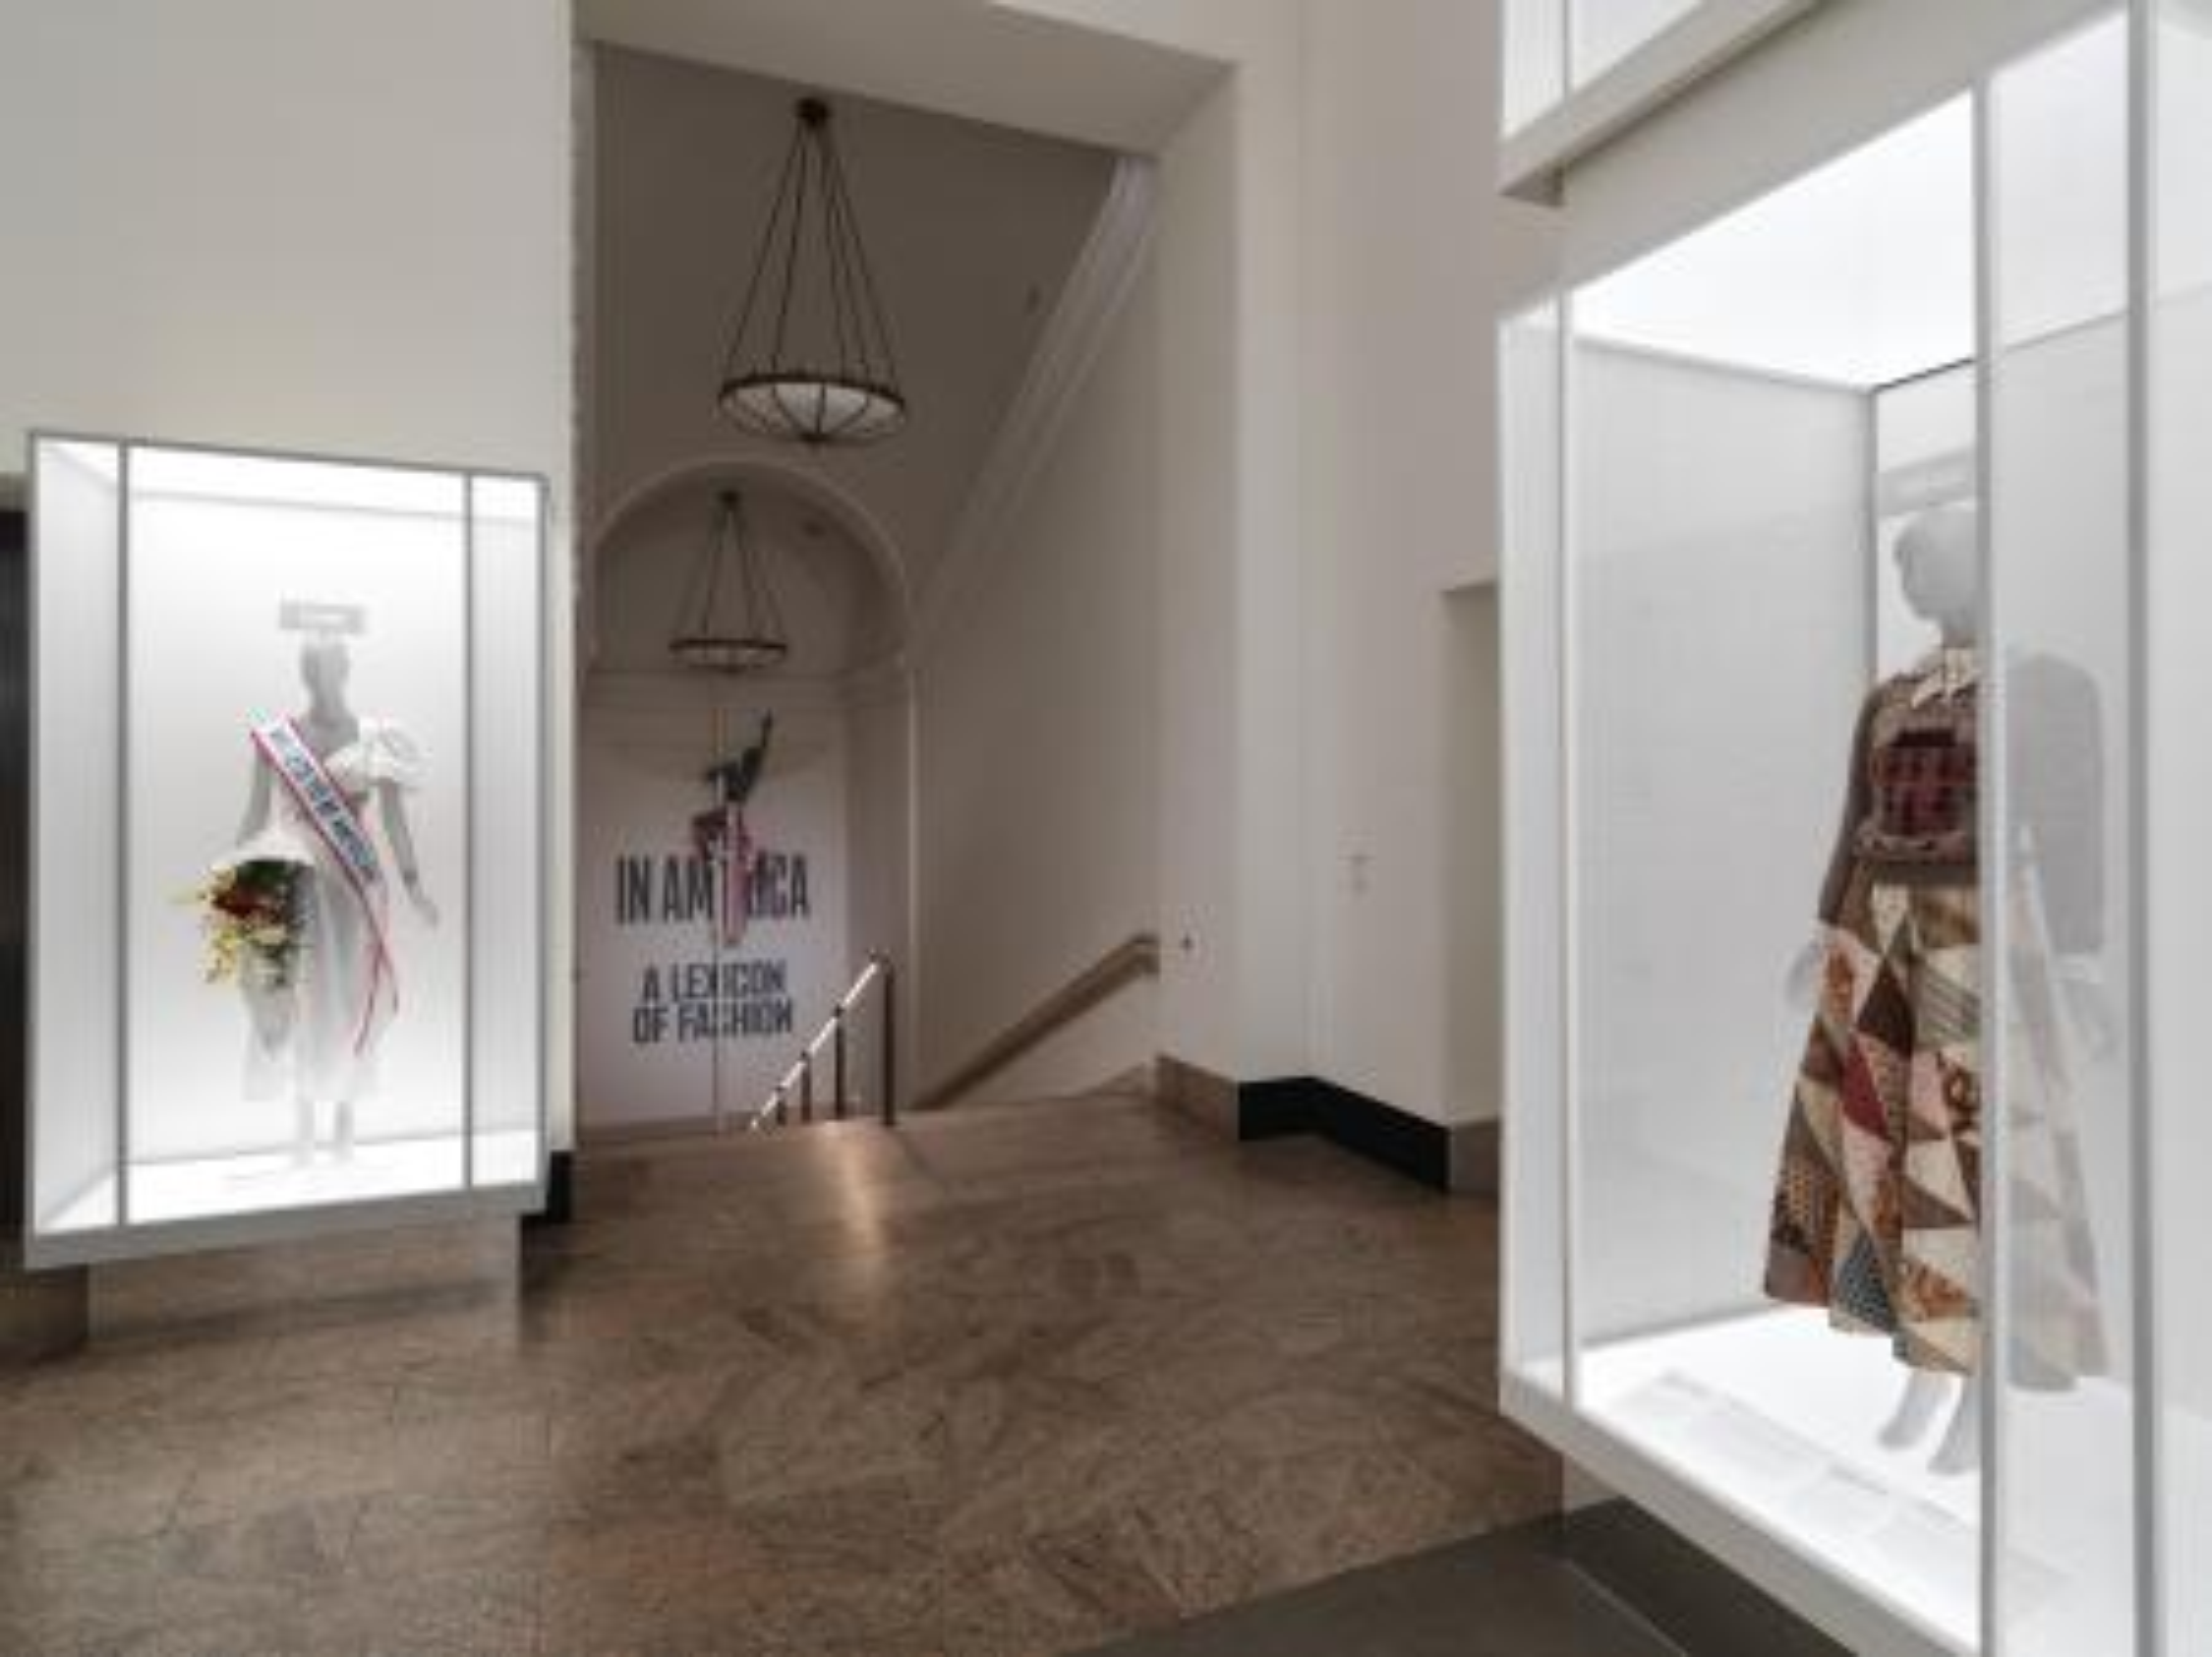 Gallery view: Met Costume Institute